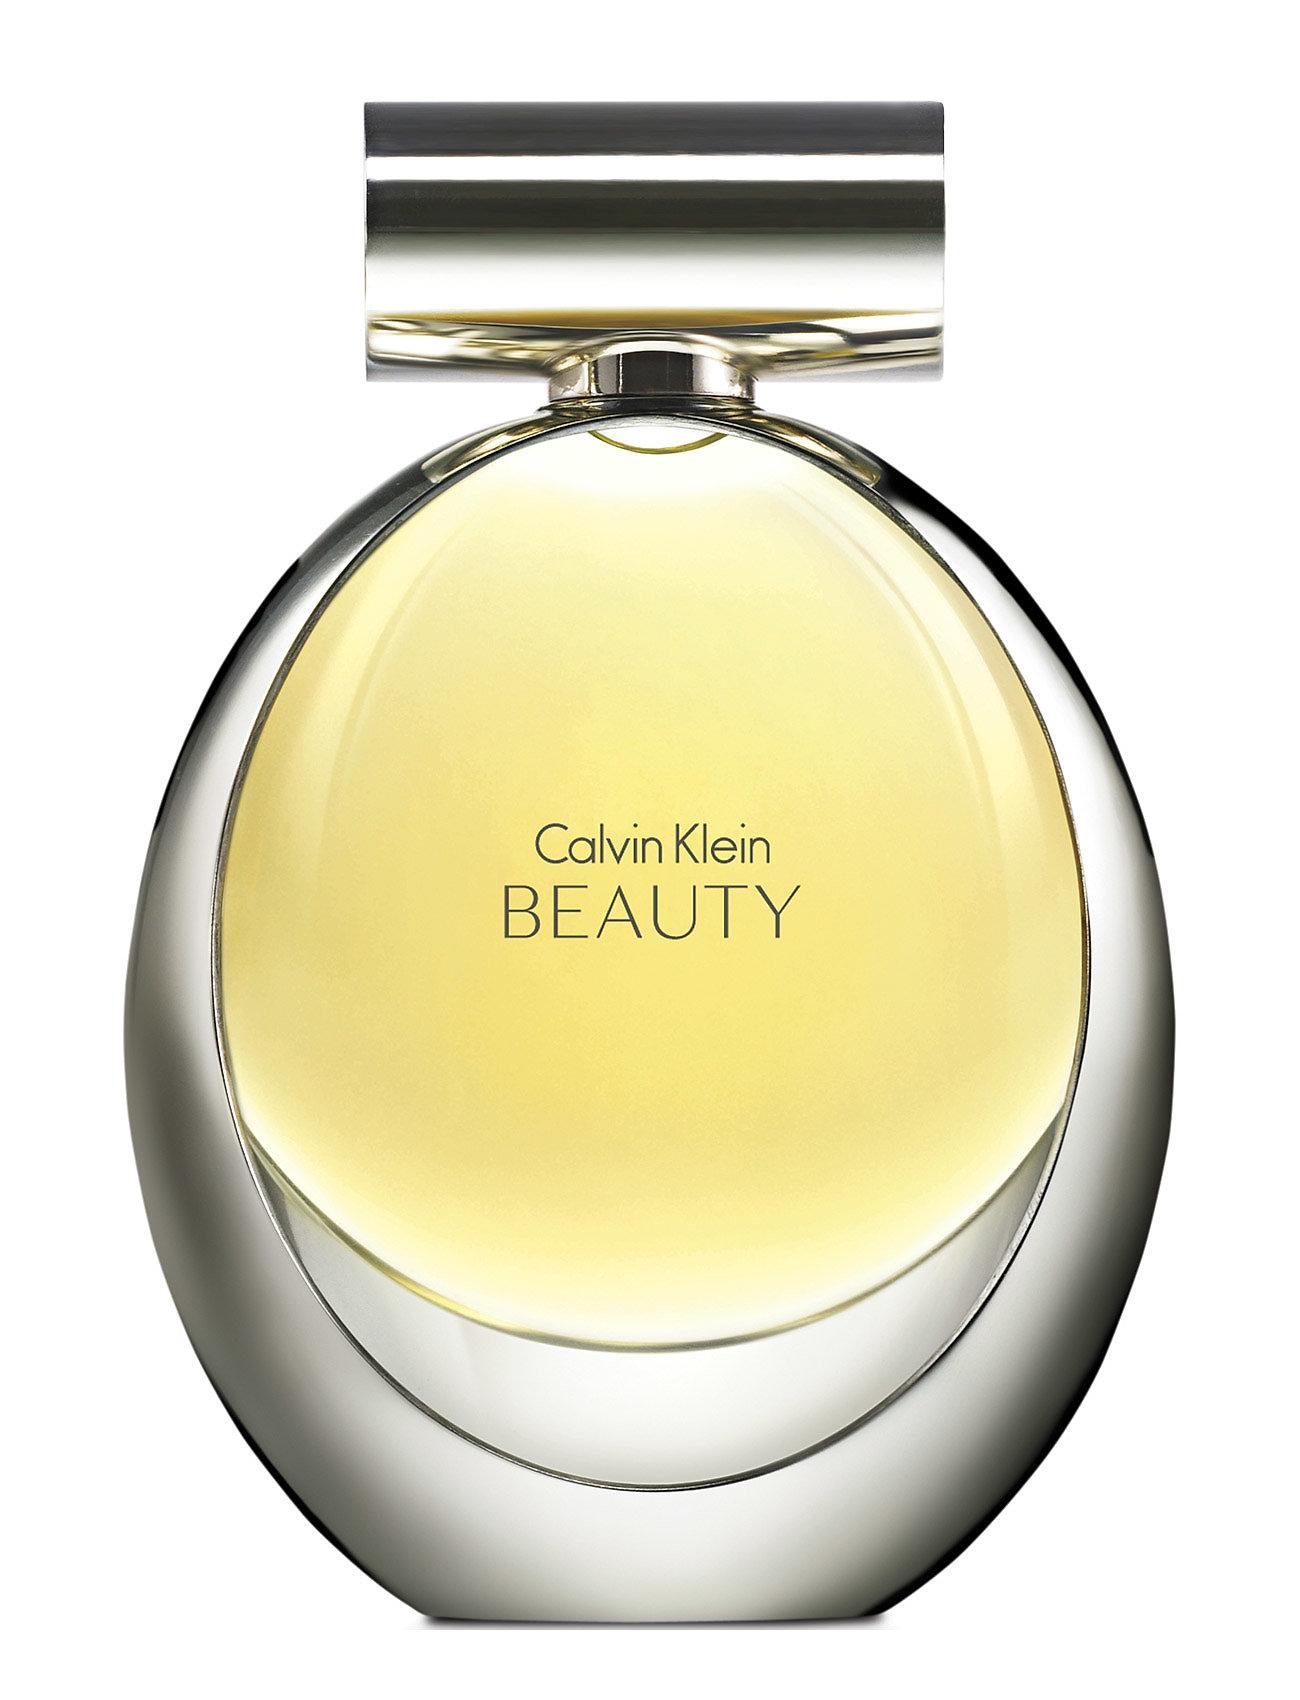 calvin klein fragrance – Calvin klein beauty eau de parfum fra boozt.com dk